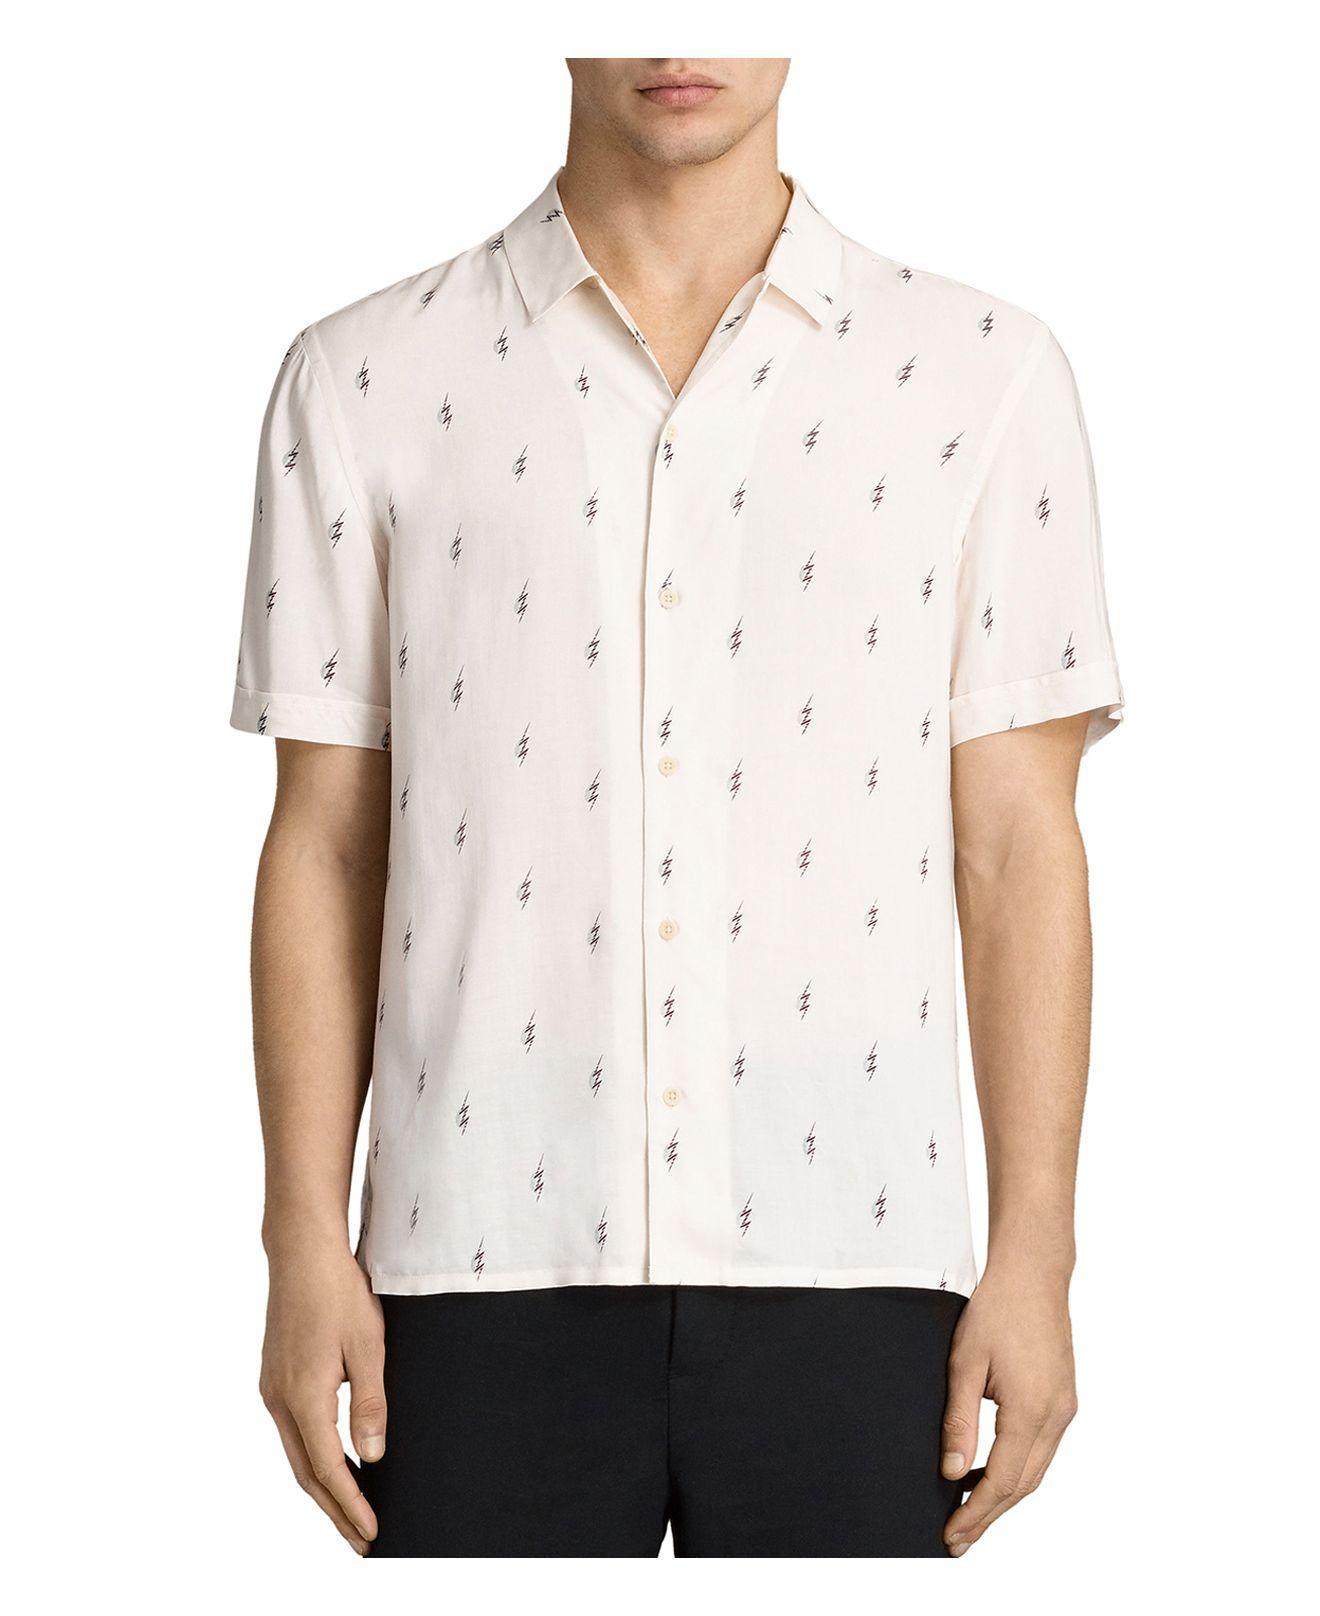 Lyst allsaints cygnus slim fit button down shirt in for Slim fit white button down shirt